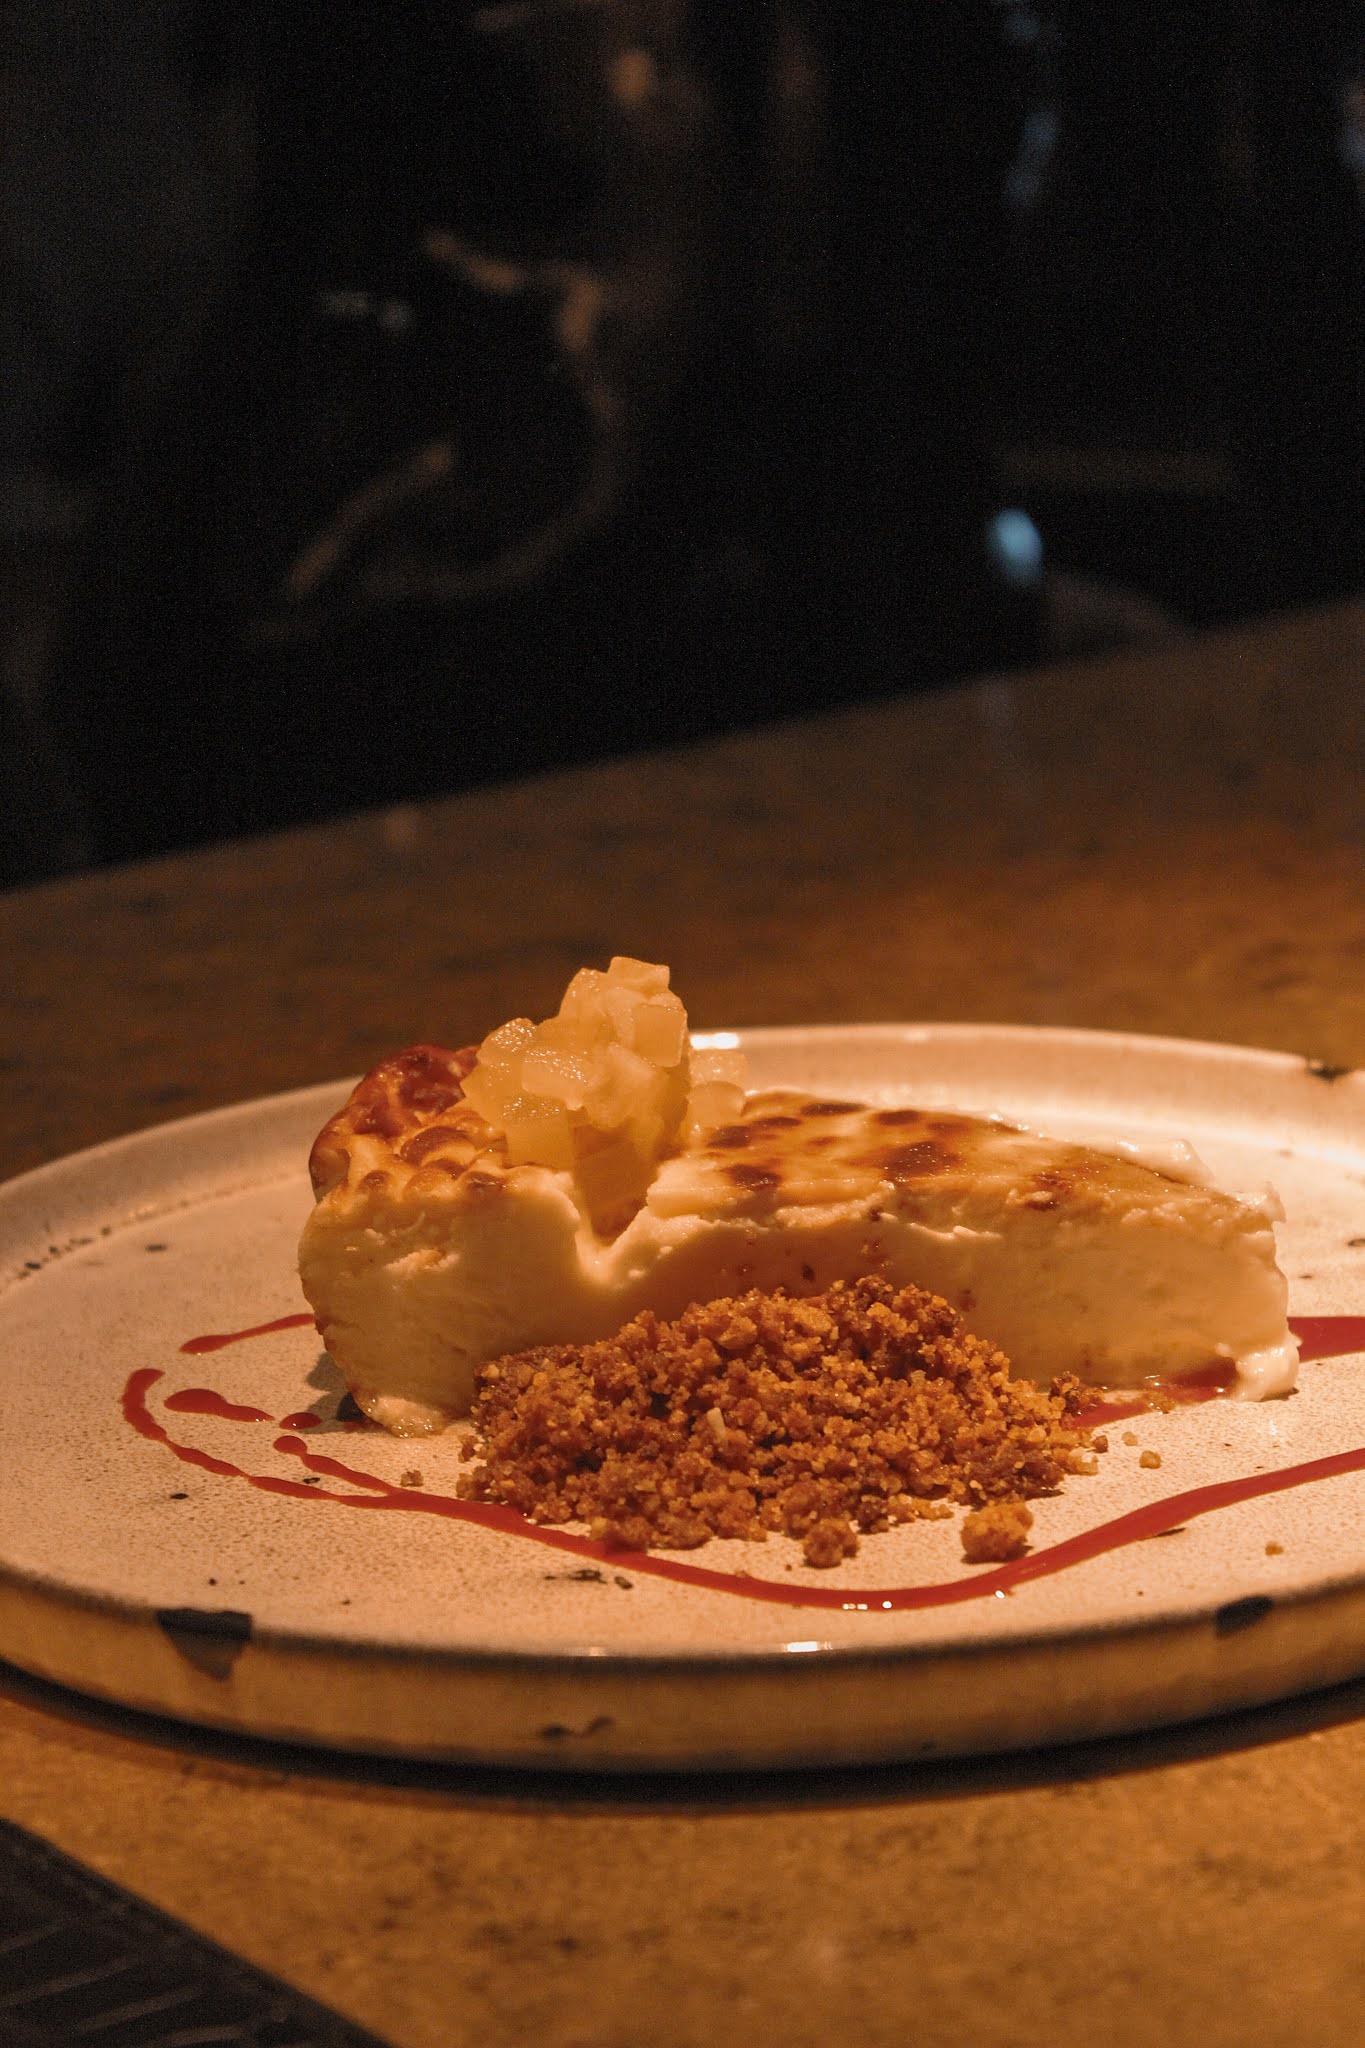 restaurante-zielou-madrid-tarta-queso-payoyo-preppyels